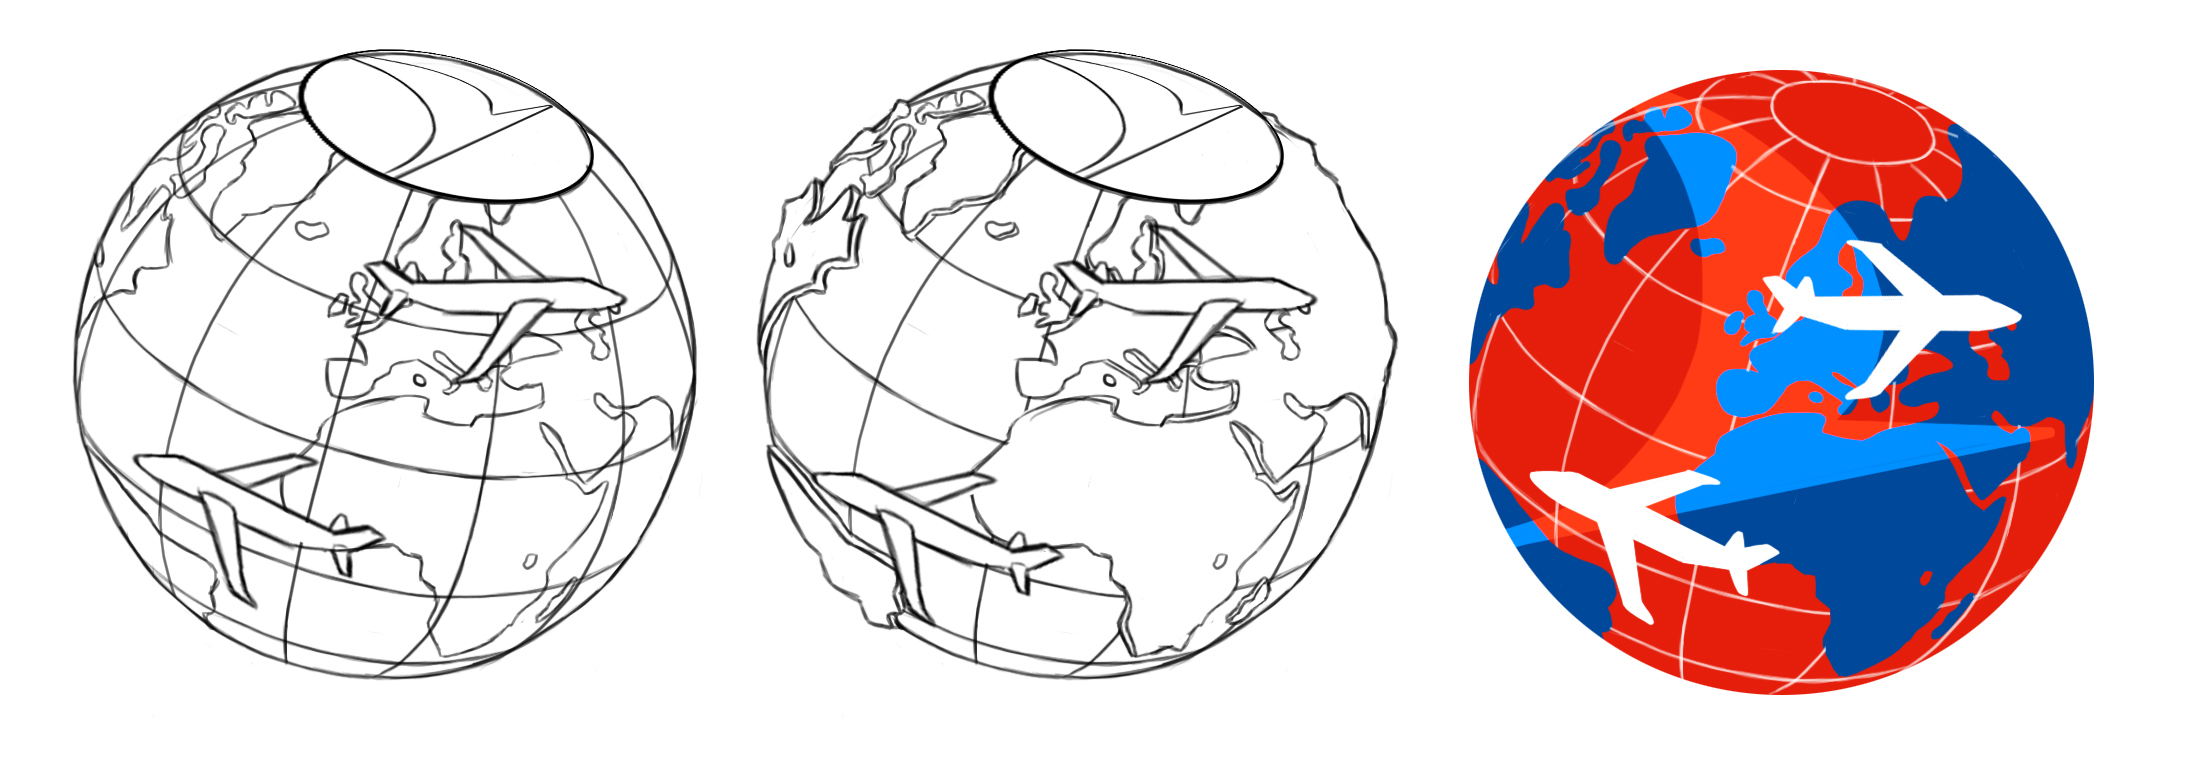 Globe_concepts.jpg